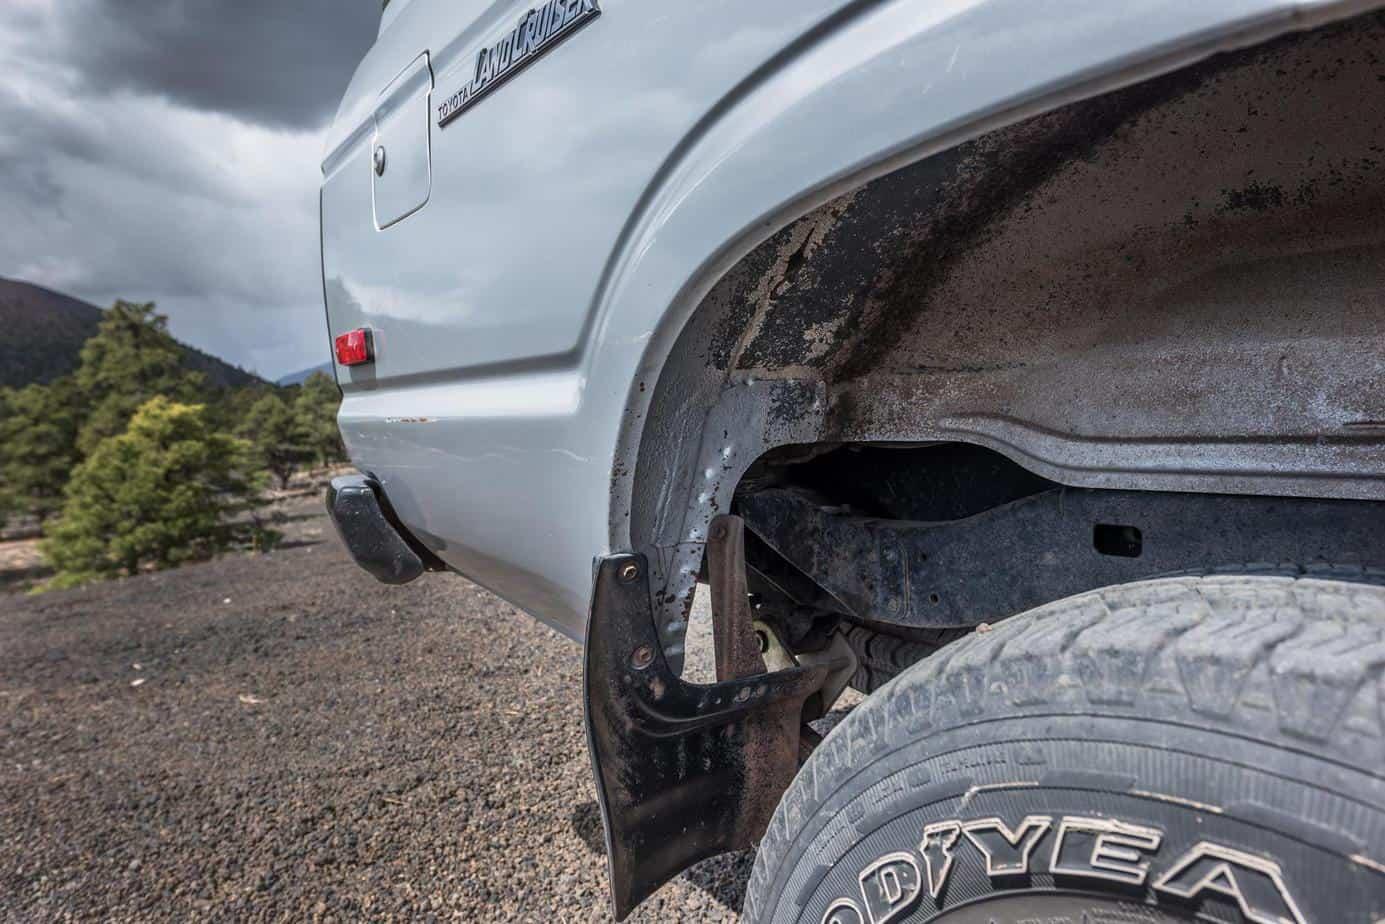 Adventure Driven pass rear wheel well-1 (Copy)